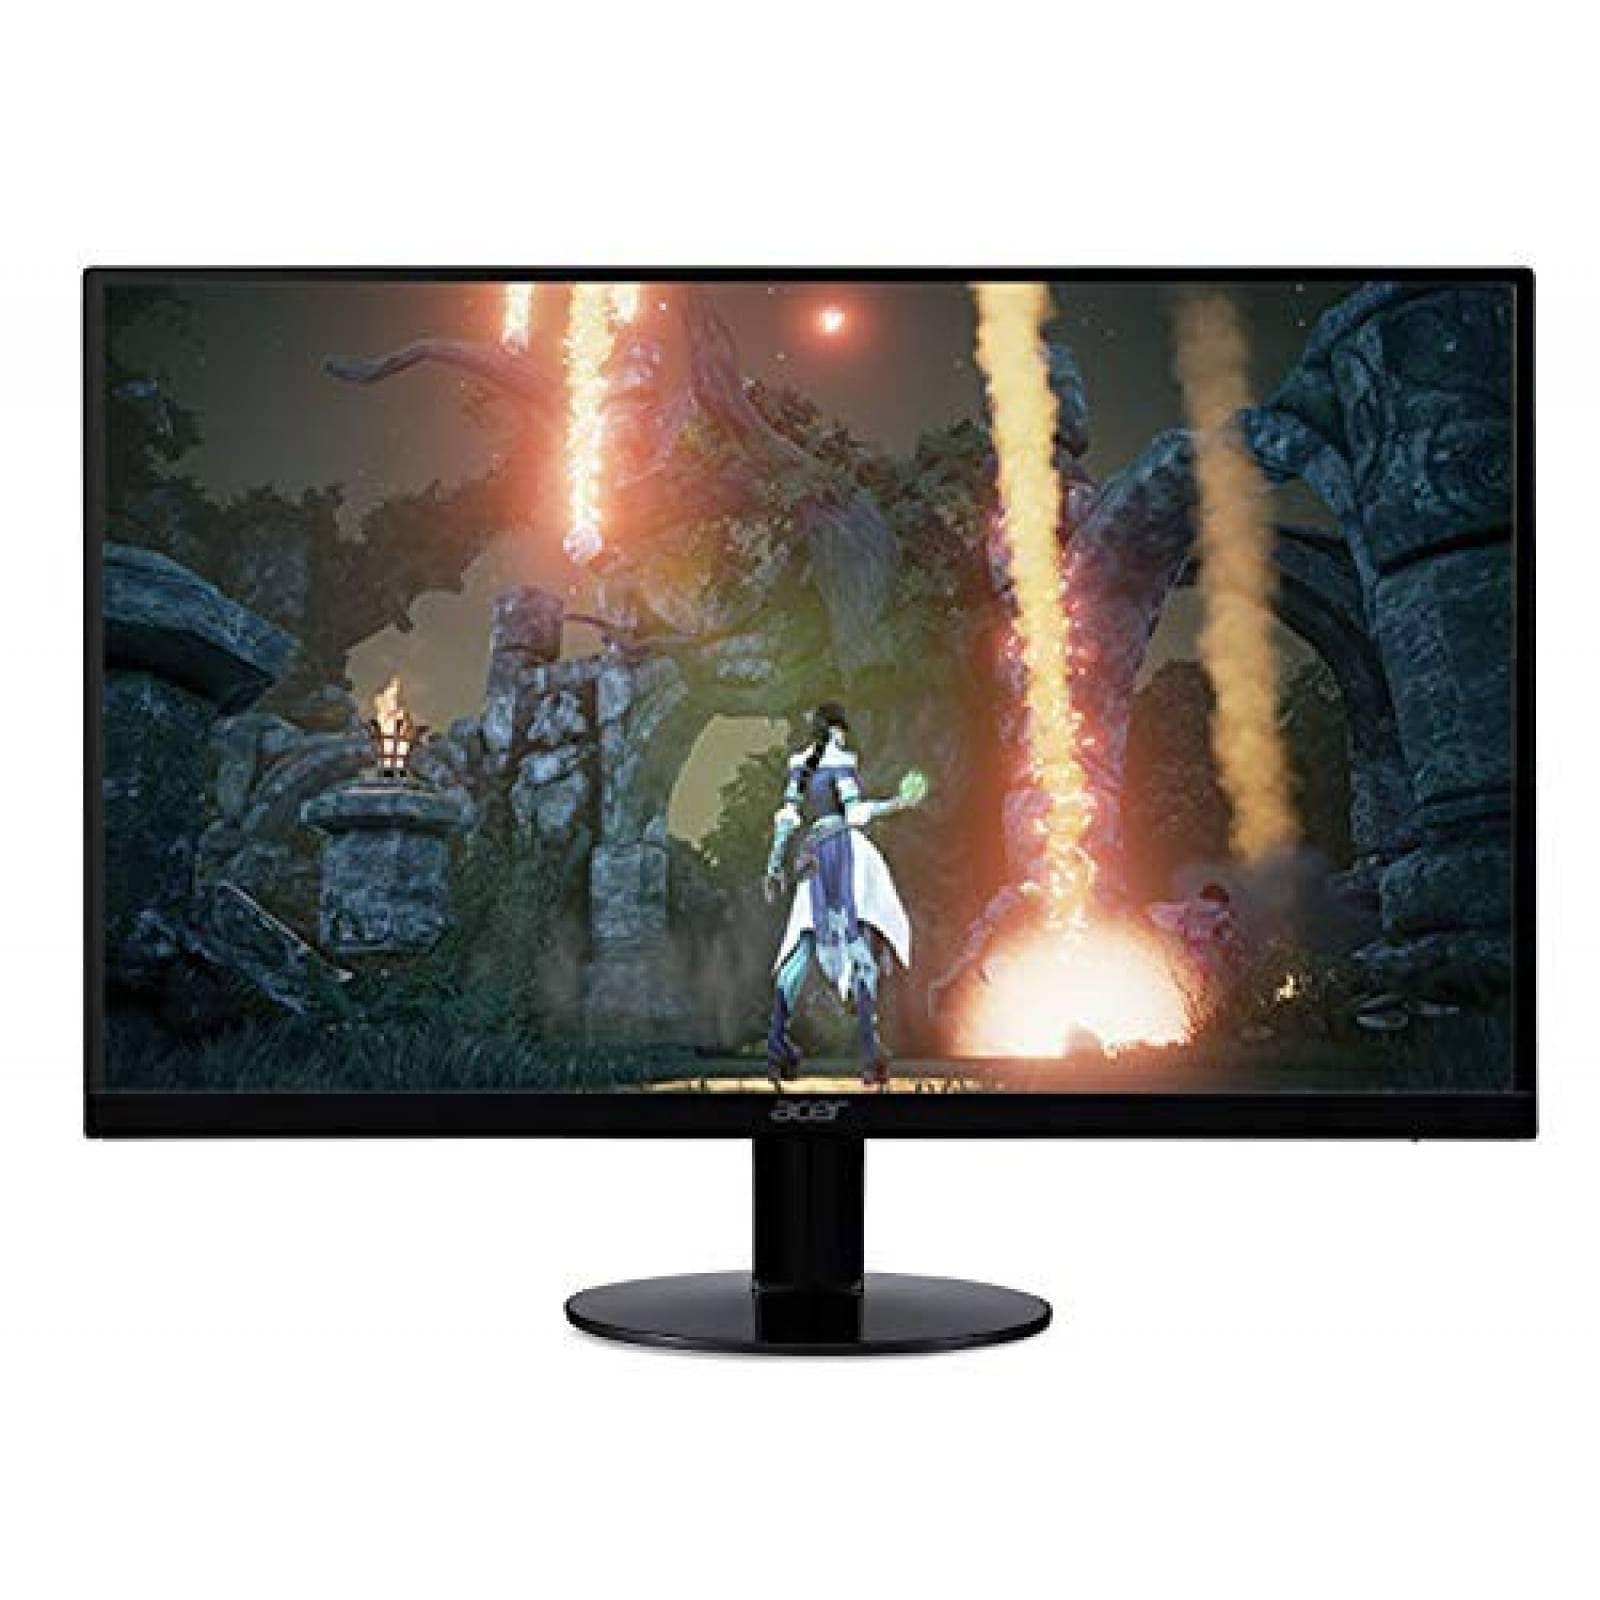 "Monitor Acer SB270 Bbix FHD 27"" 1920 x 1080 HDMI VGA -negro"